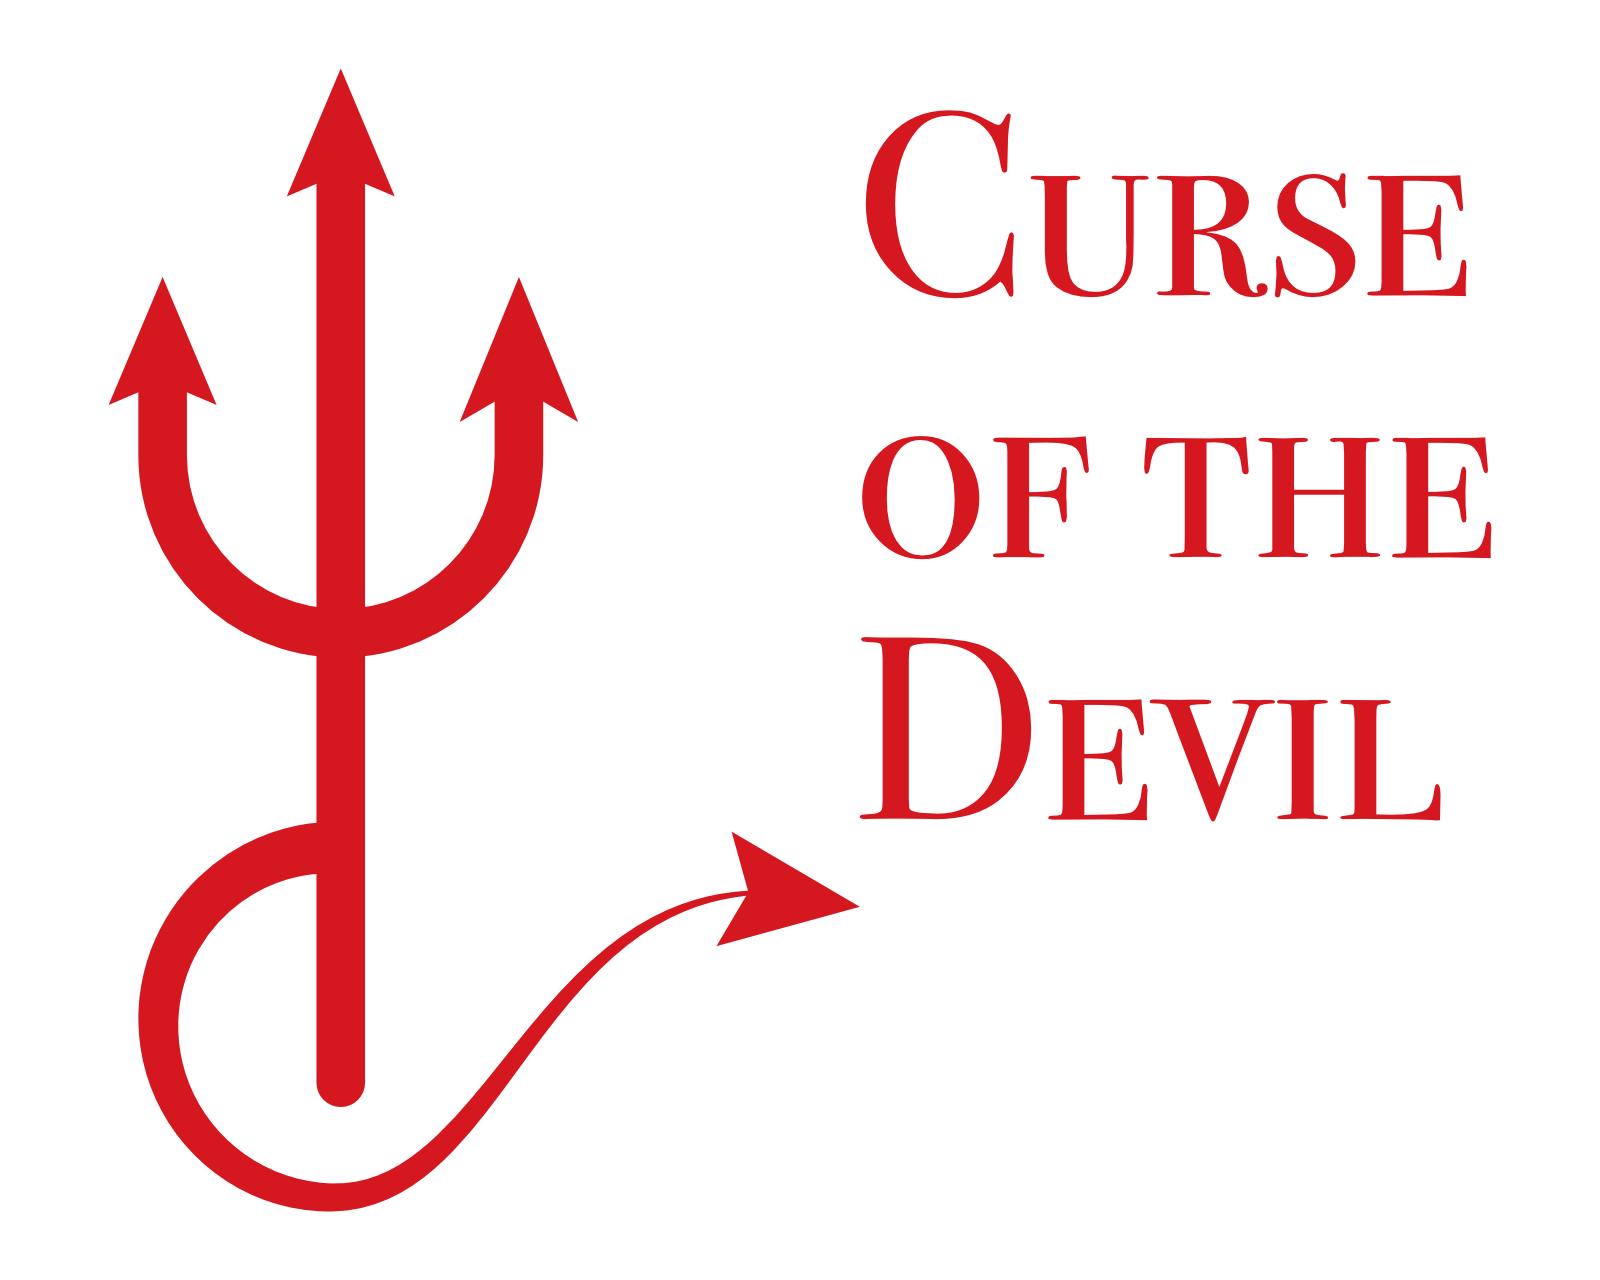 Devils Curse